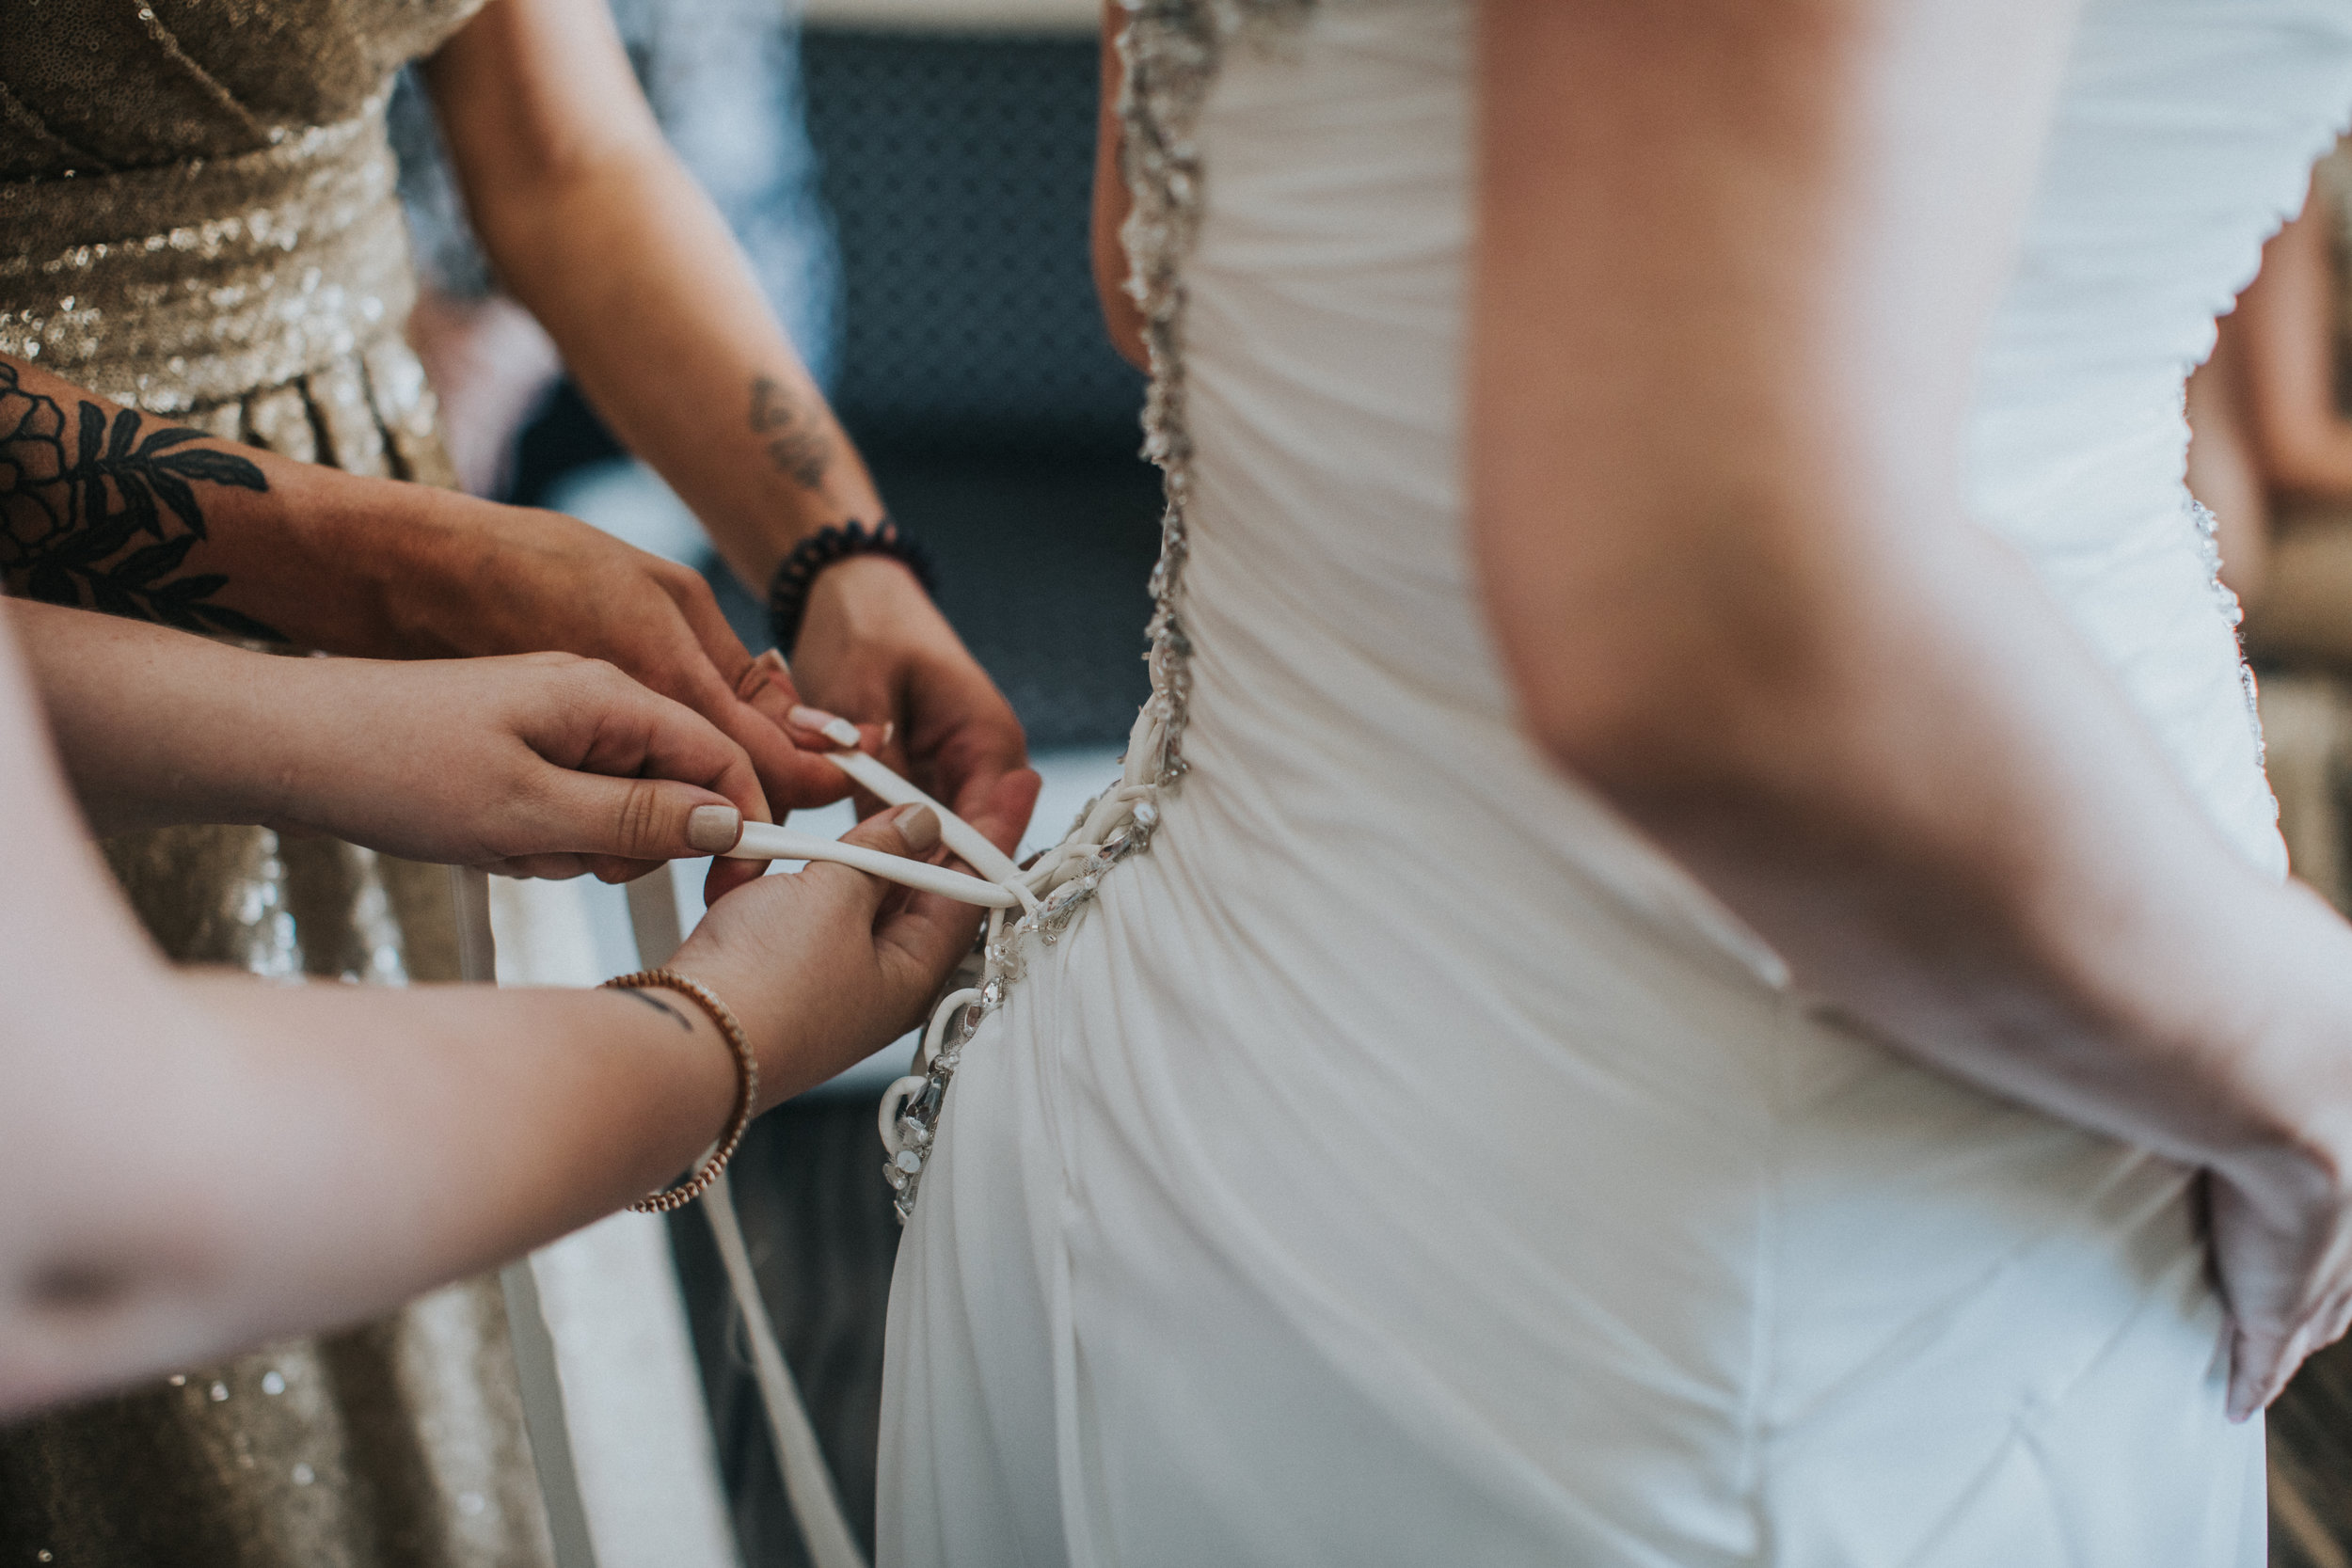 JennaLynnPhotography-NJWeddingPhotographer-Wedding-TheBerkeley-AsburyPark-Allison&Michael-GettingReady-74.jpg